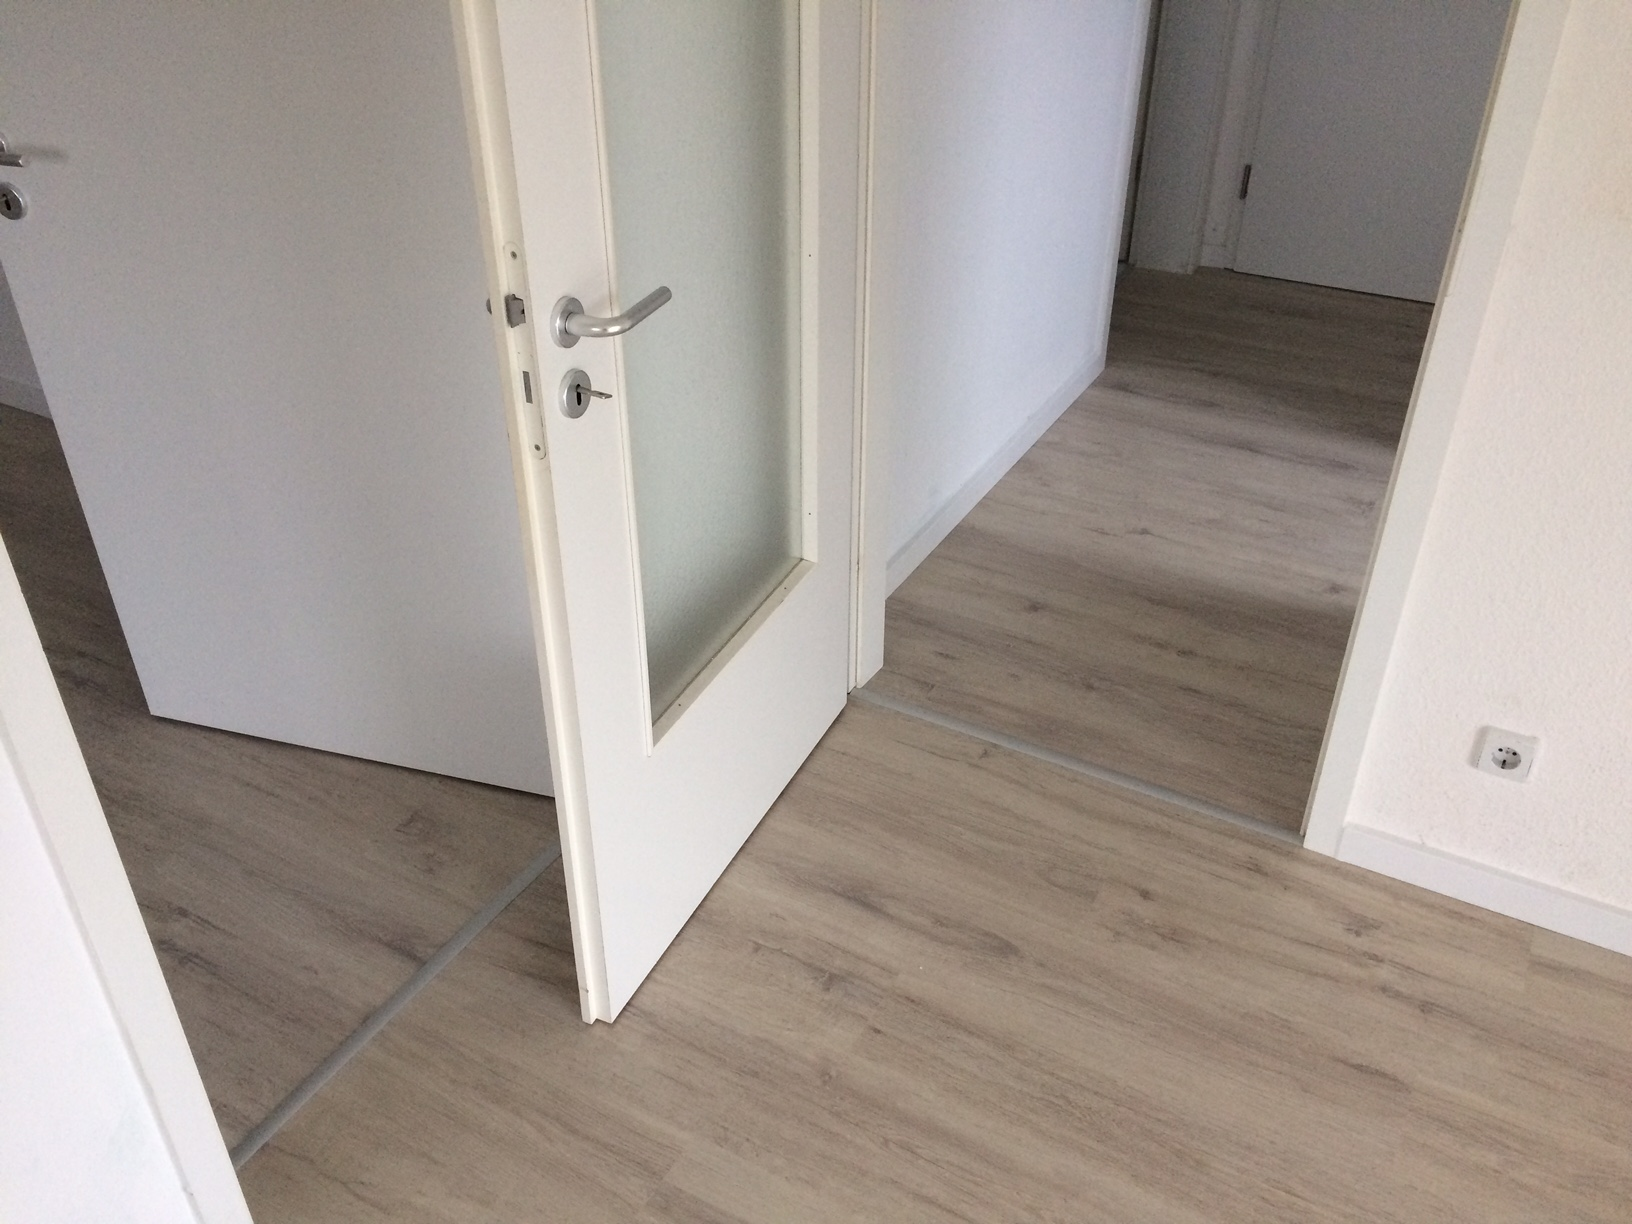 Fußboden Verlegen Zwickau ~ Laminat verlegen ihr fussboden profi